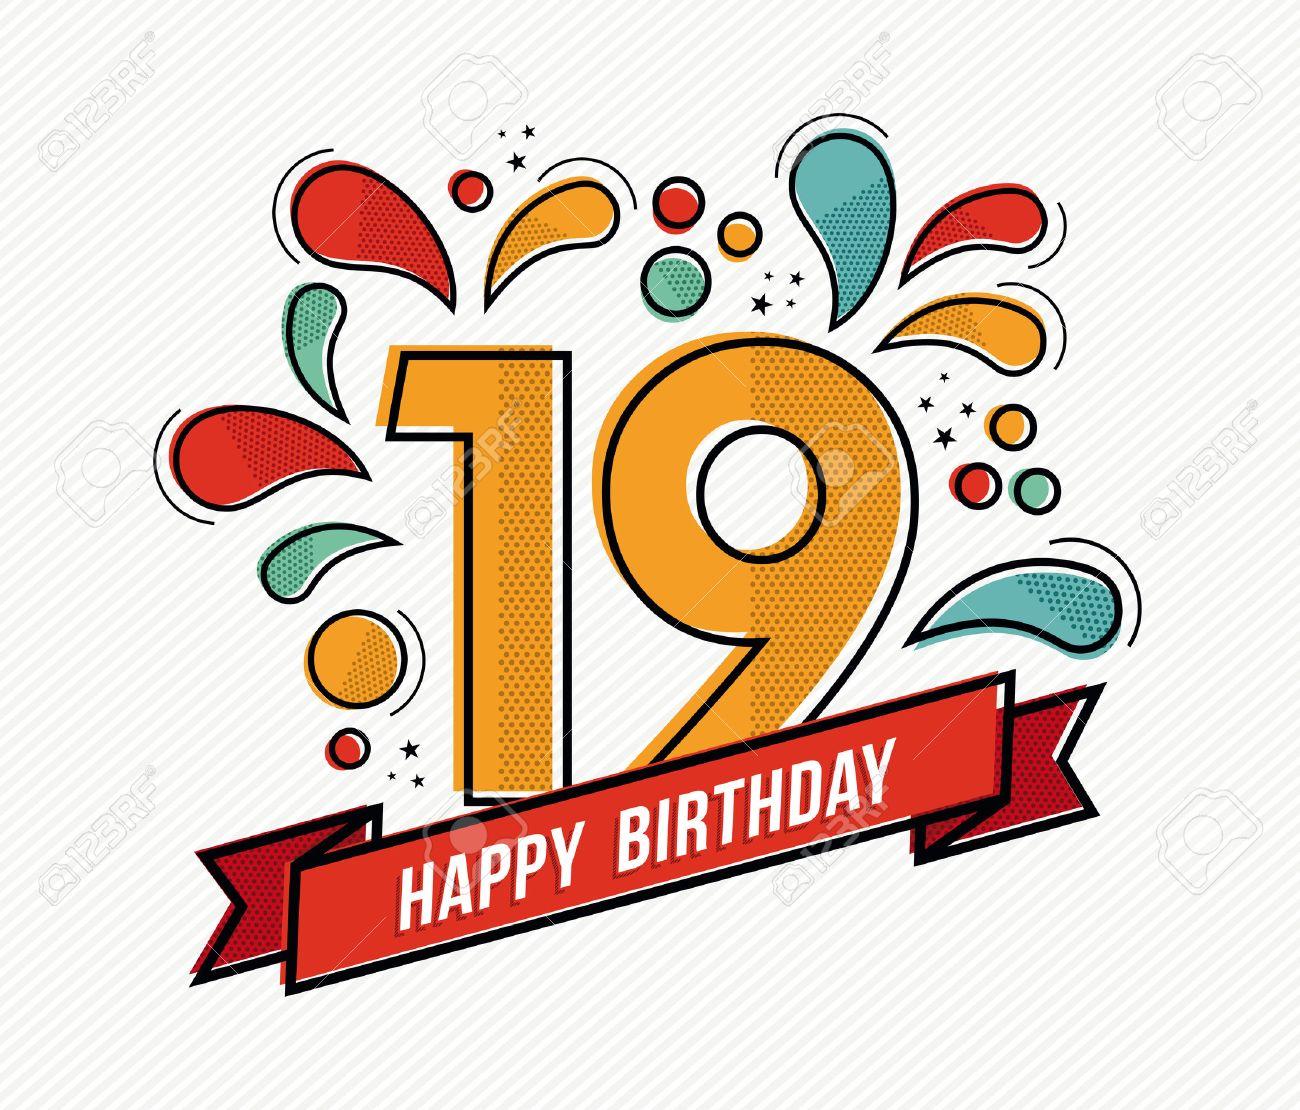 Feliz cumpleanos hija 19 anos